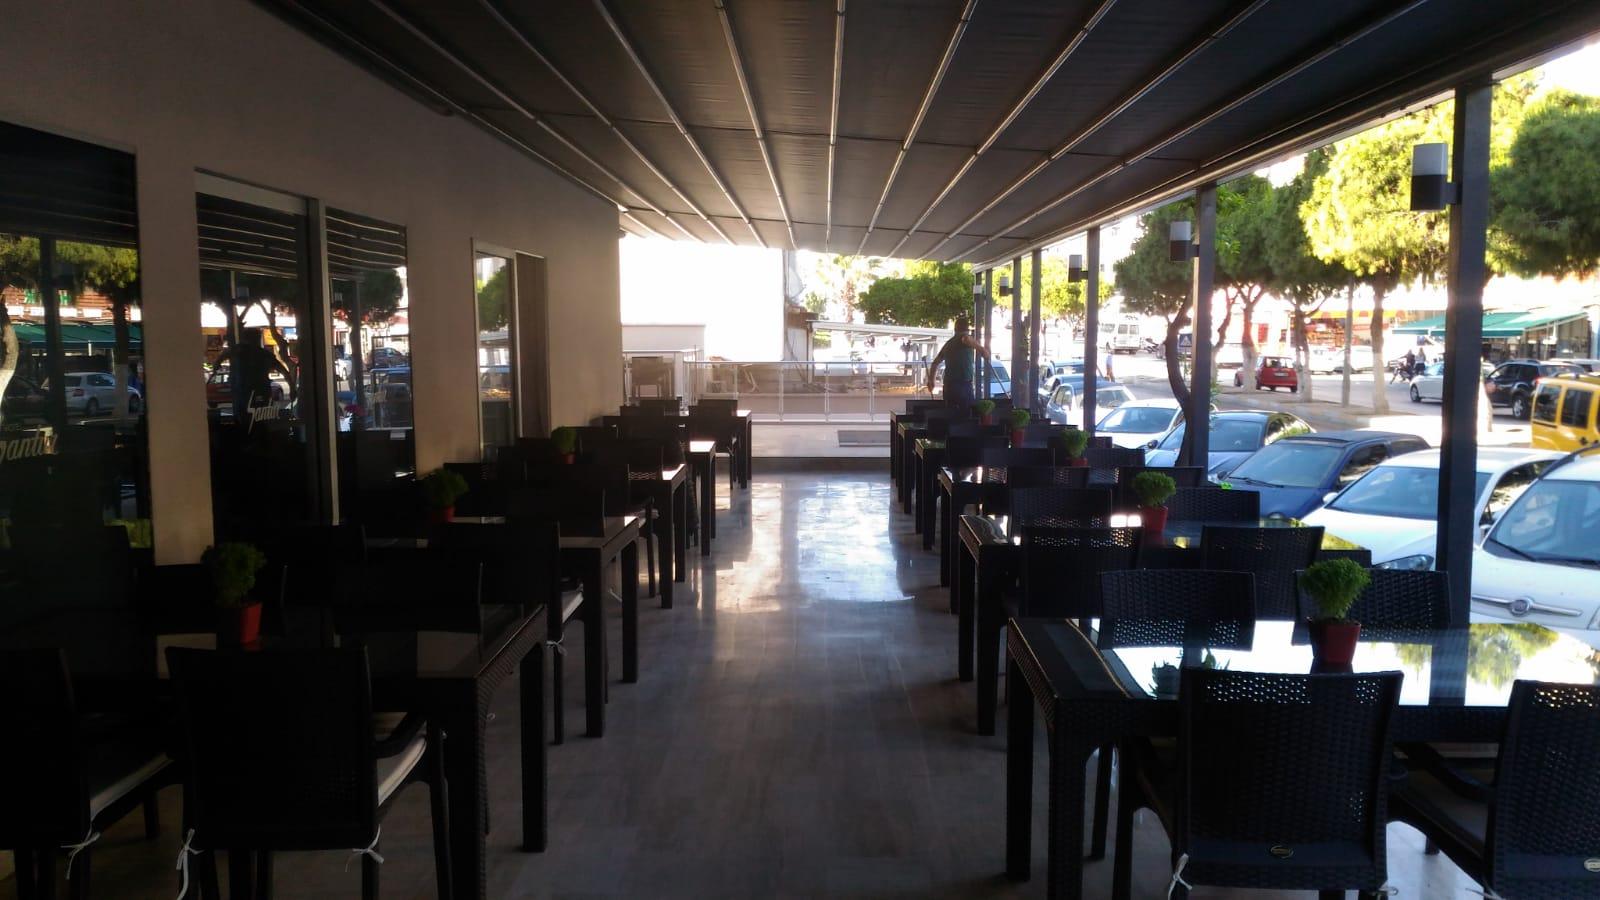 Letovanje Turska autobusom, Kusadasi, Hotel  Roxx Royal Santur,hotelski restoran sspolja